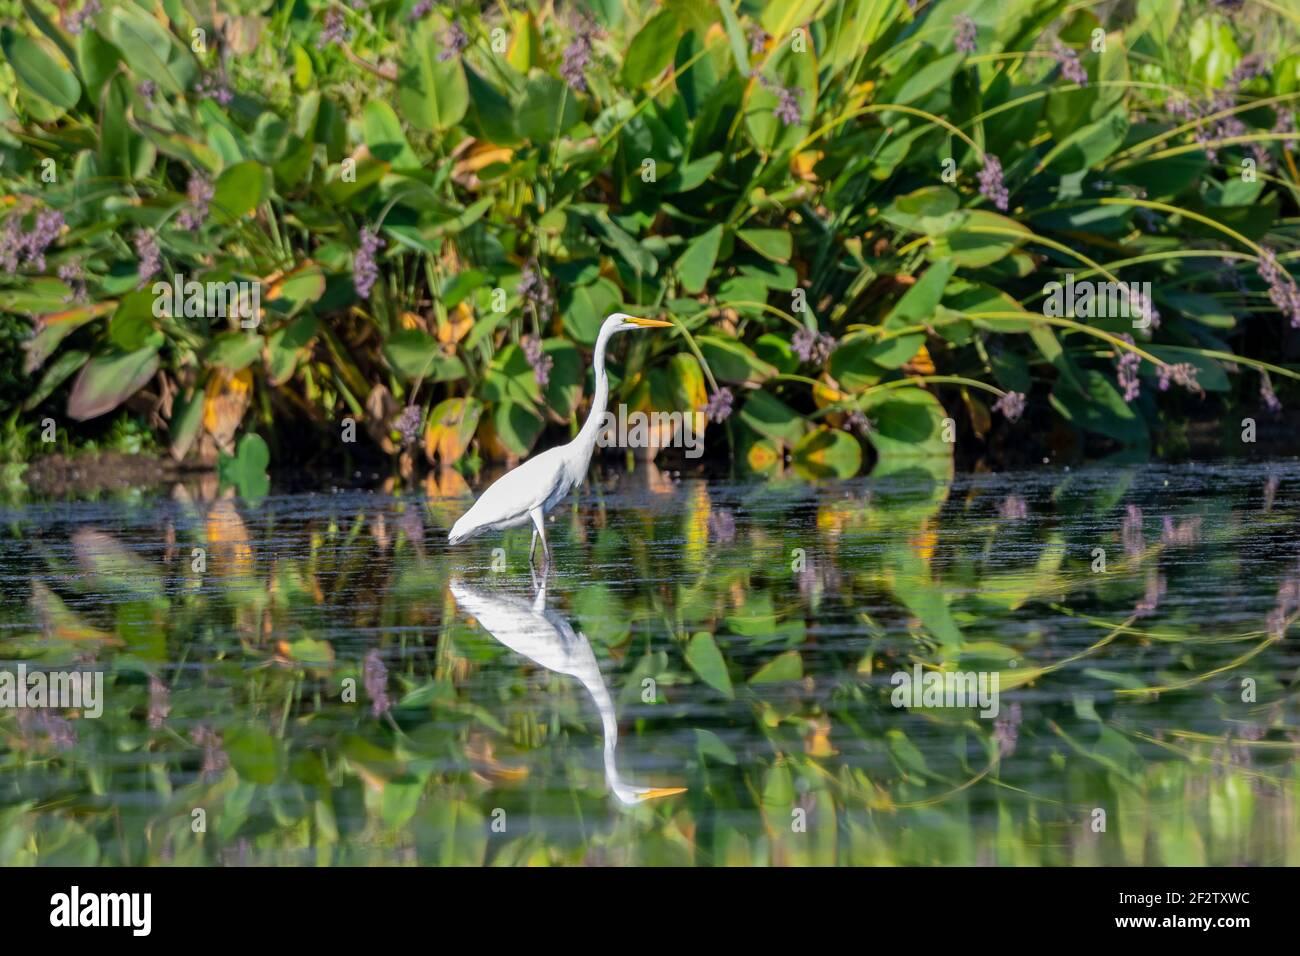 00688-03105 Great Egret (Ardea alba) fishing near Water Canna (Canna glauca) in wetland Marion Co.IL Stock Photo